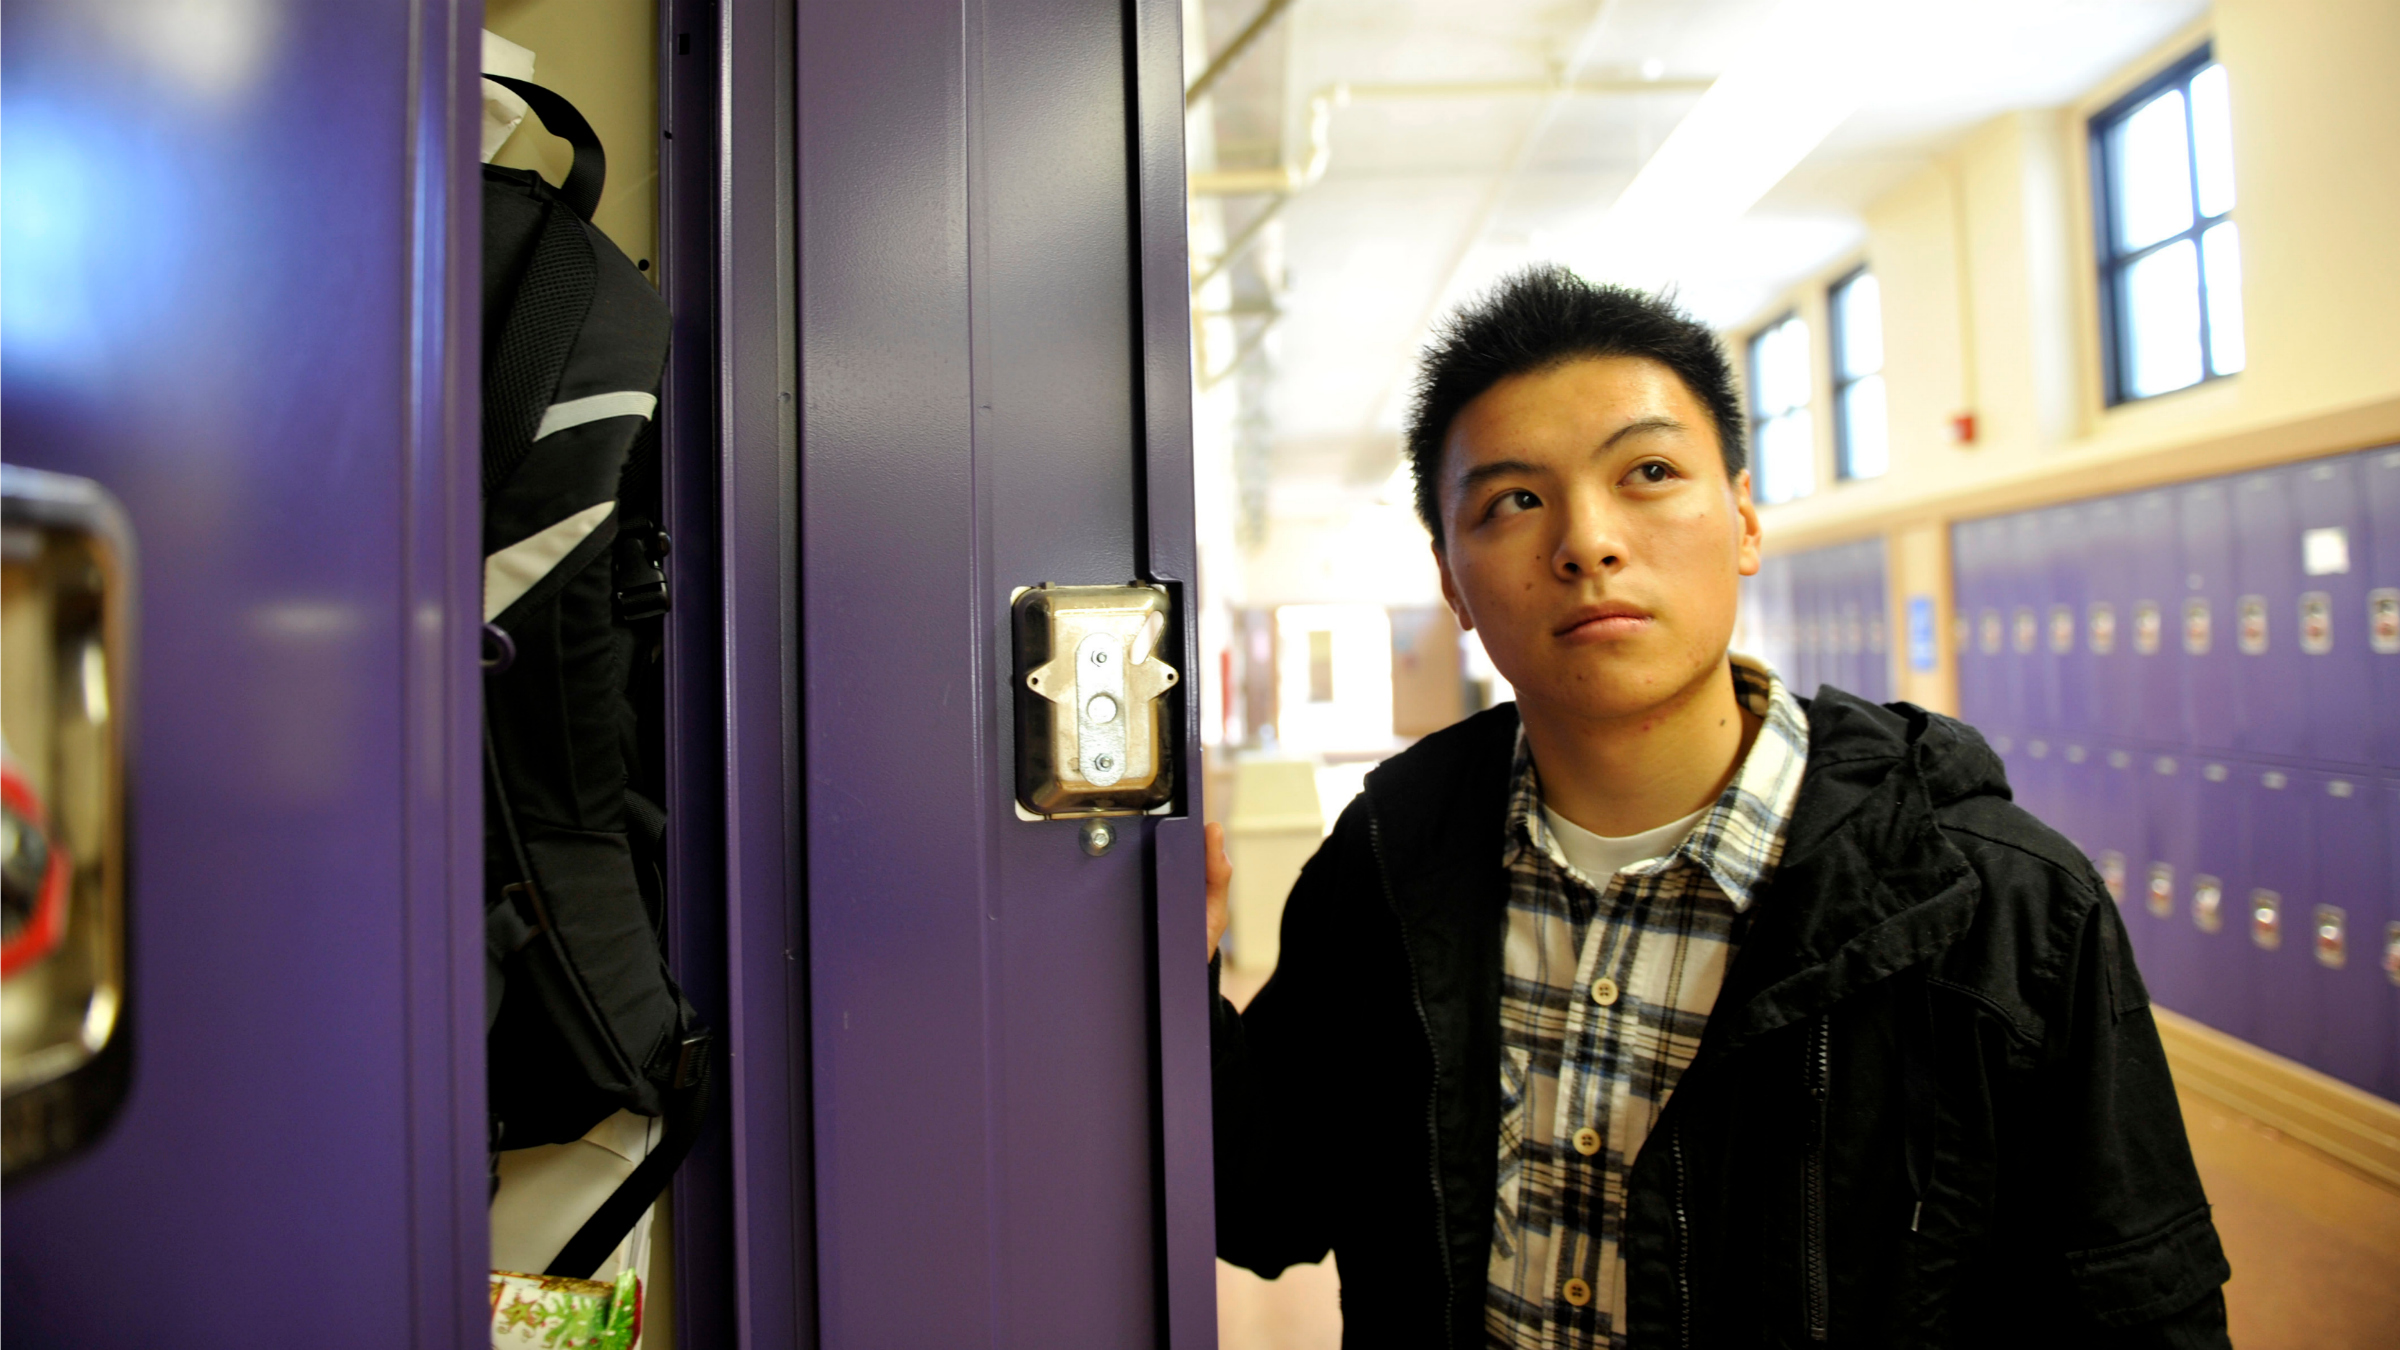 High School student daydreams by his locker.